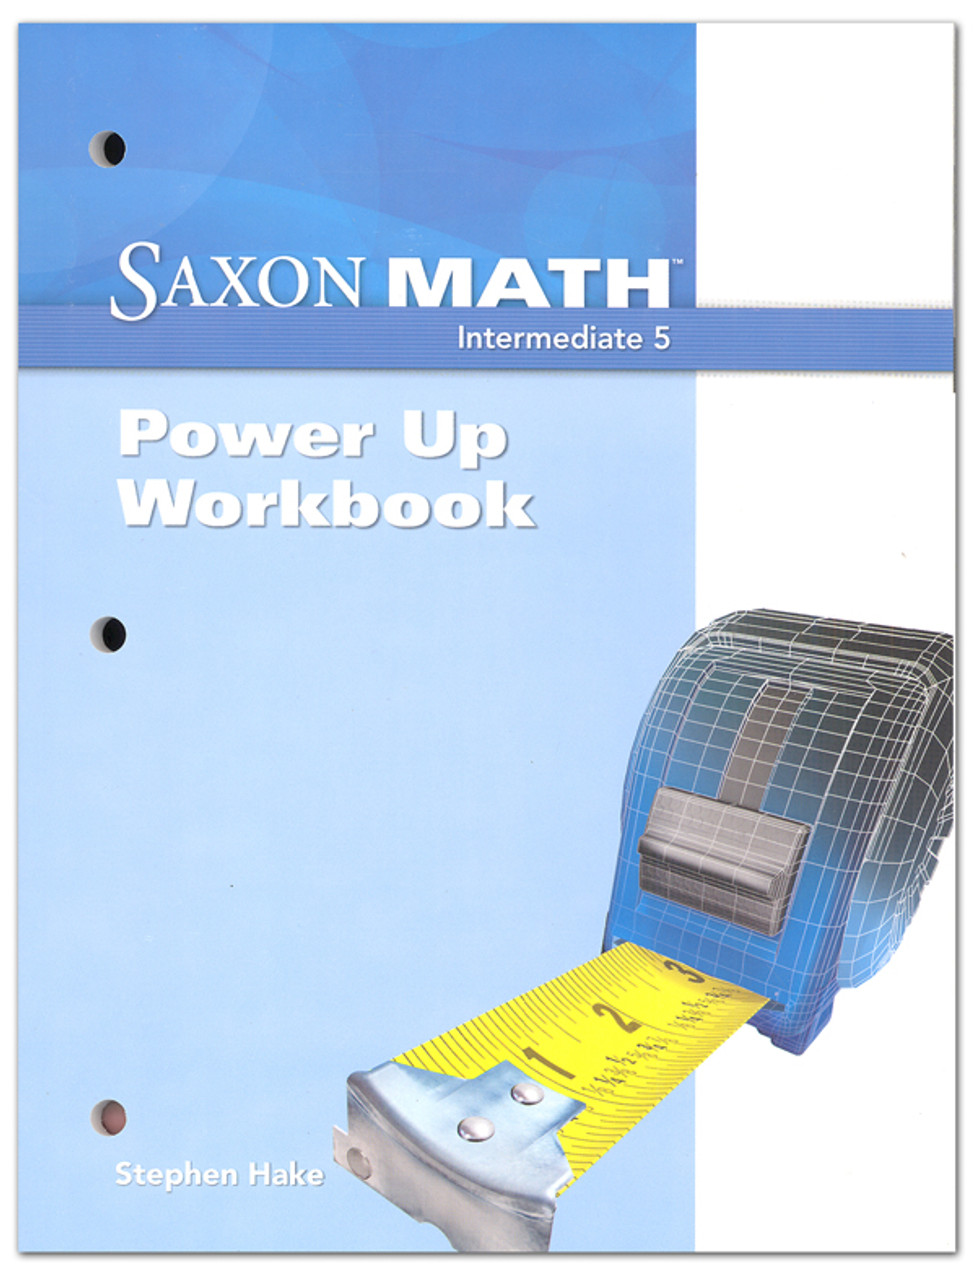 small resolution of Saxon Math Grade 5 Intermediate Power Up Workbook - Classroom Resource  Center